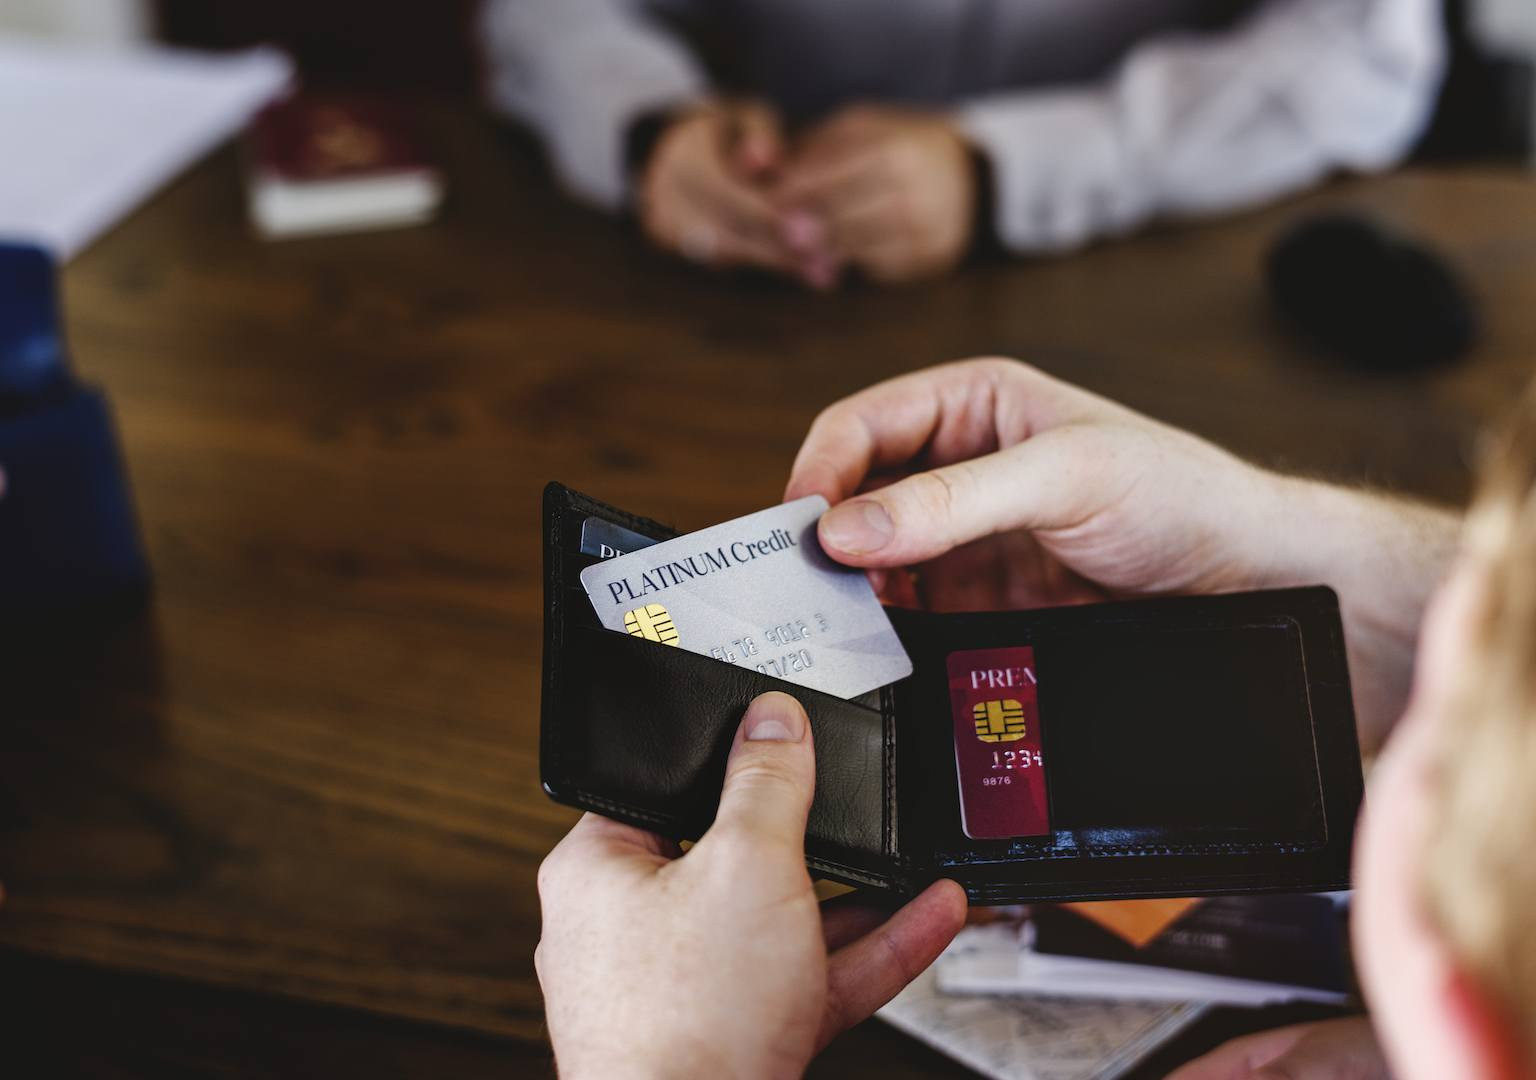 Use formas simples e seguras de pagamento online